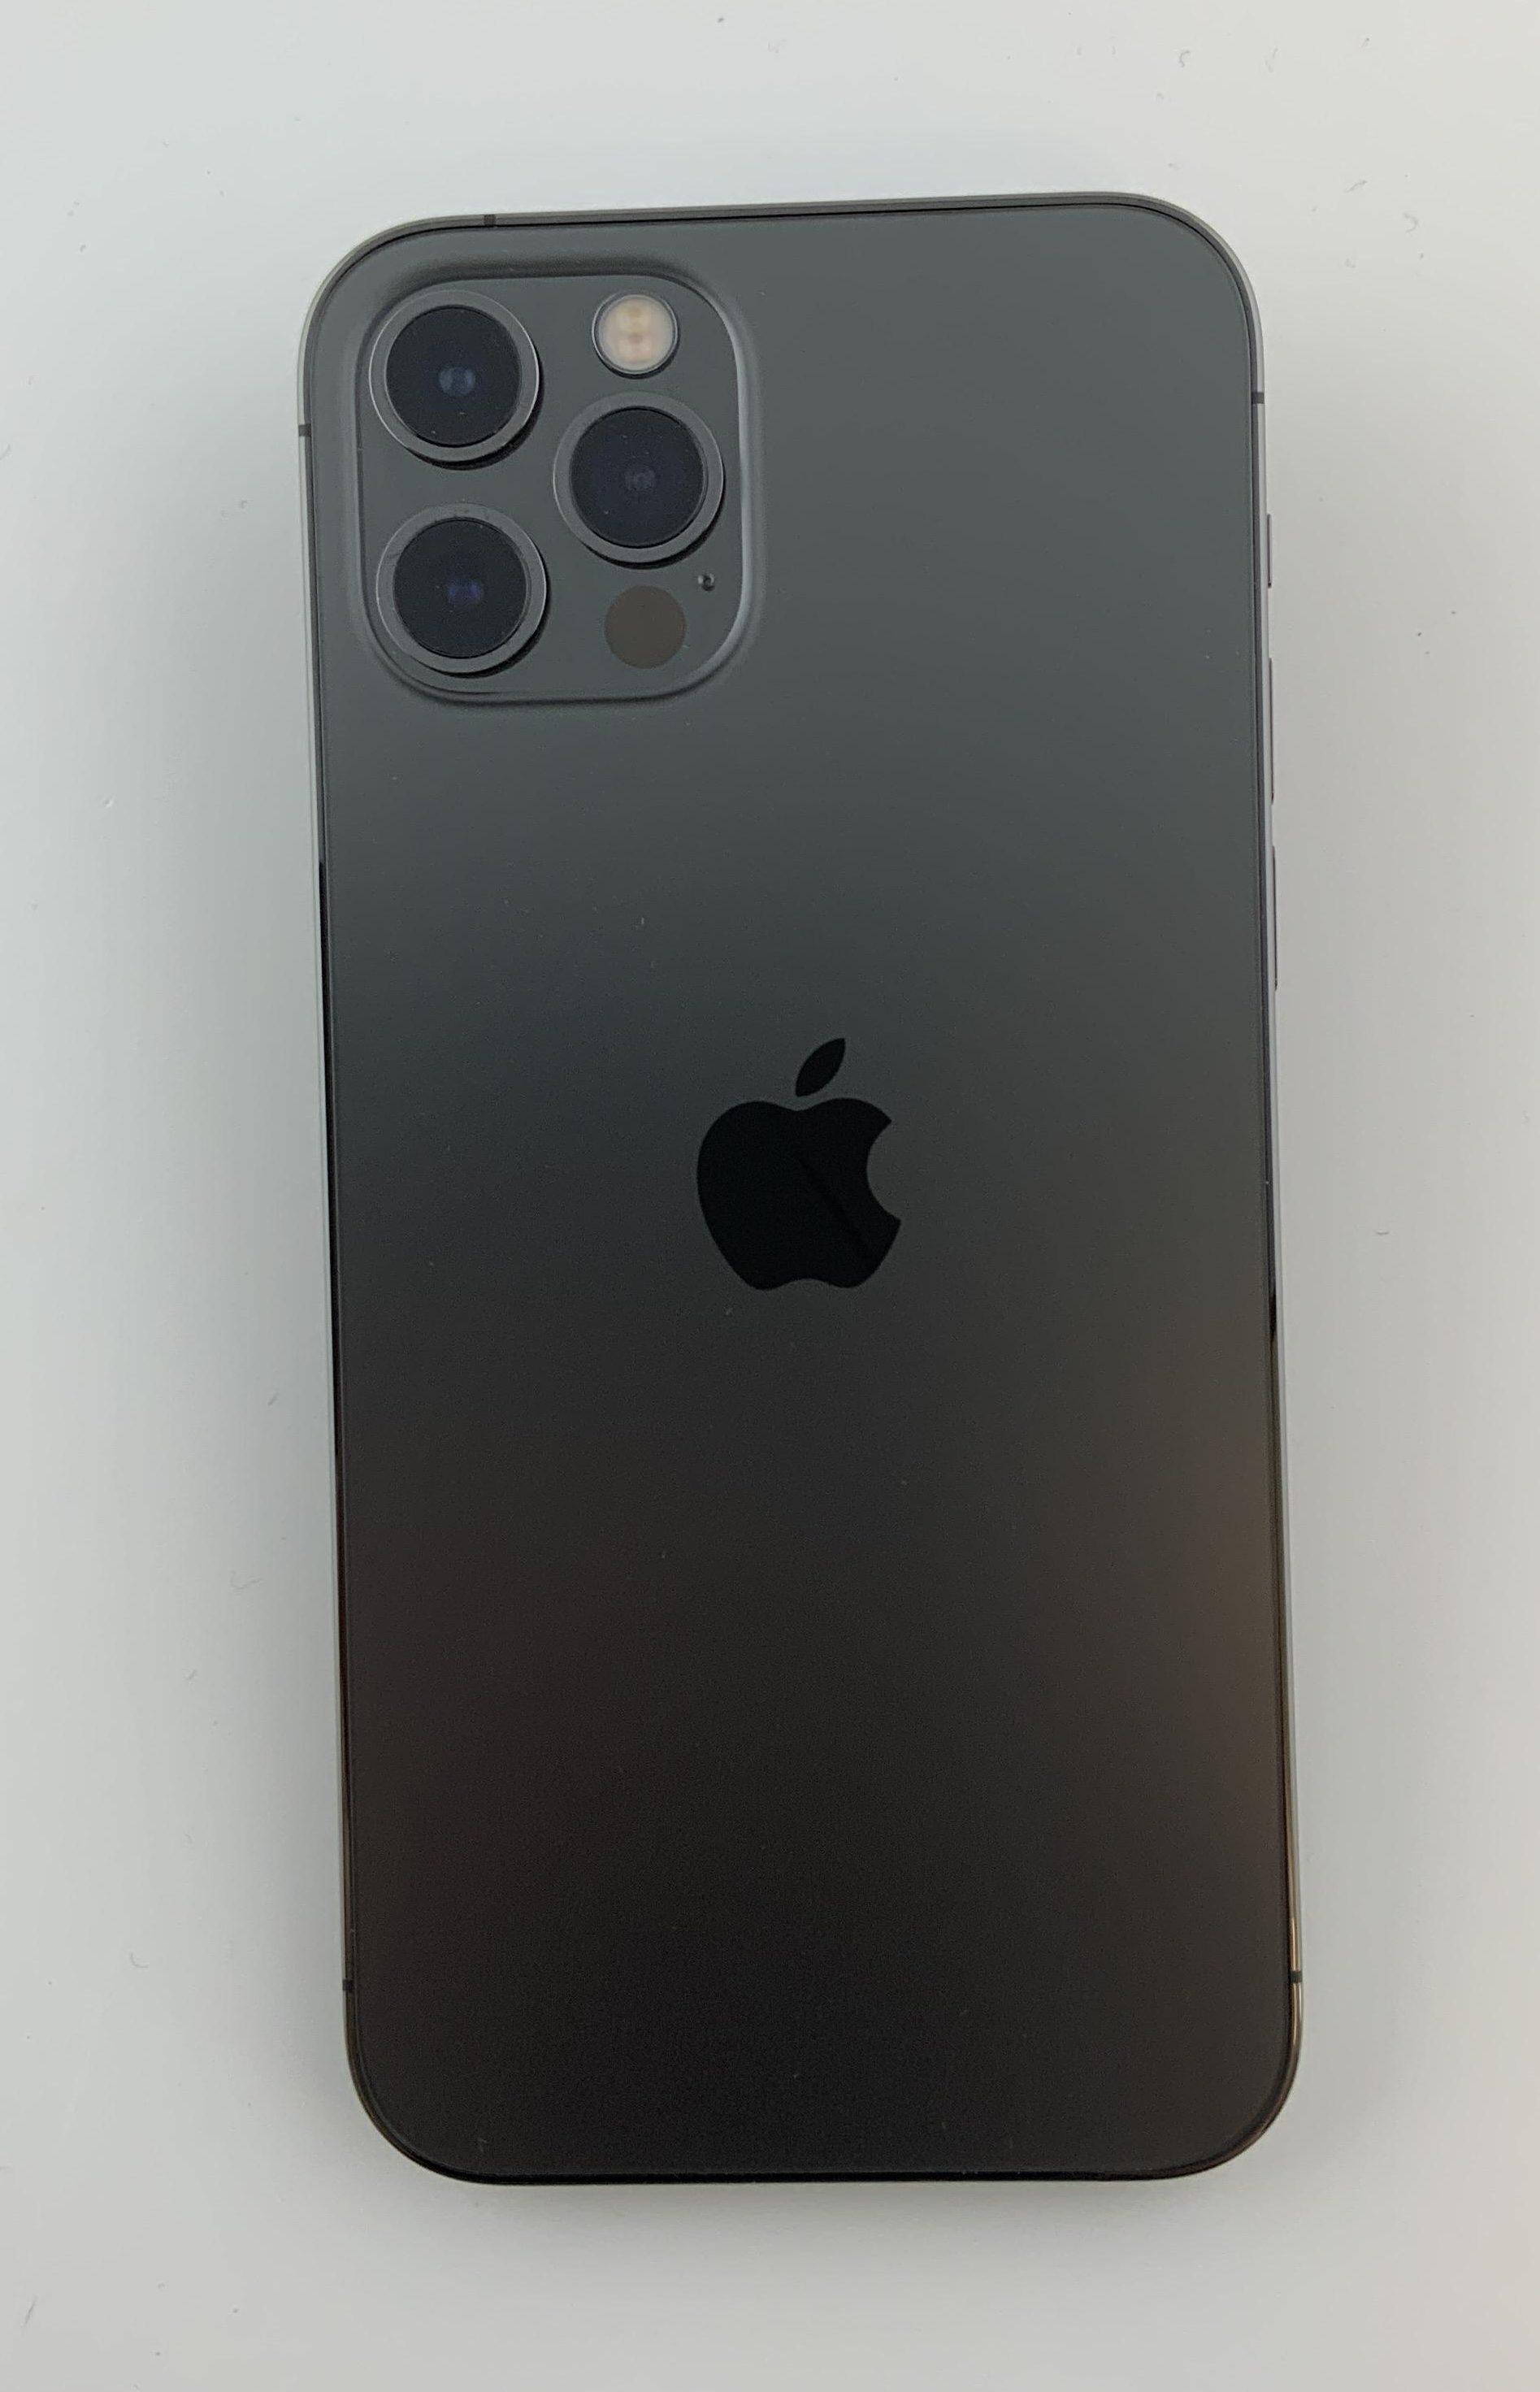 iPhone 12 Pro 256GB, 256GB, Graphite, immagine 2